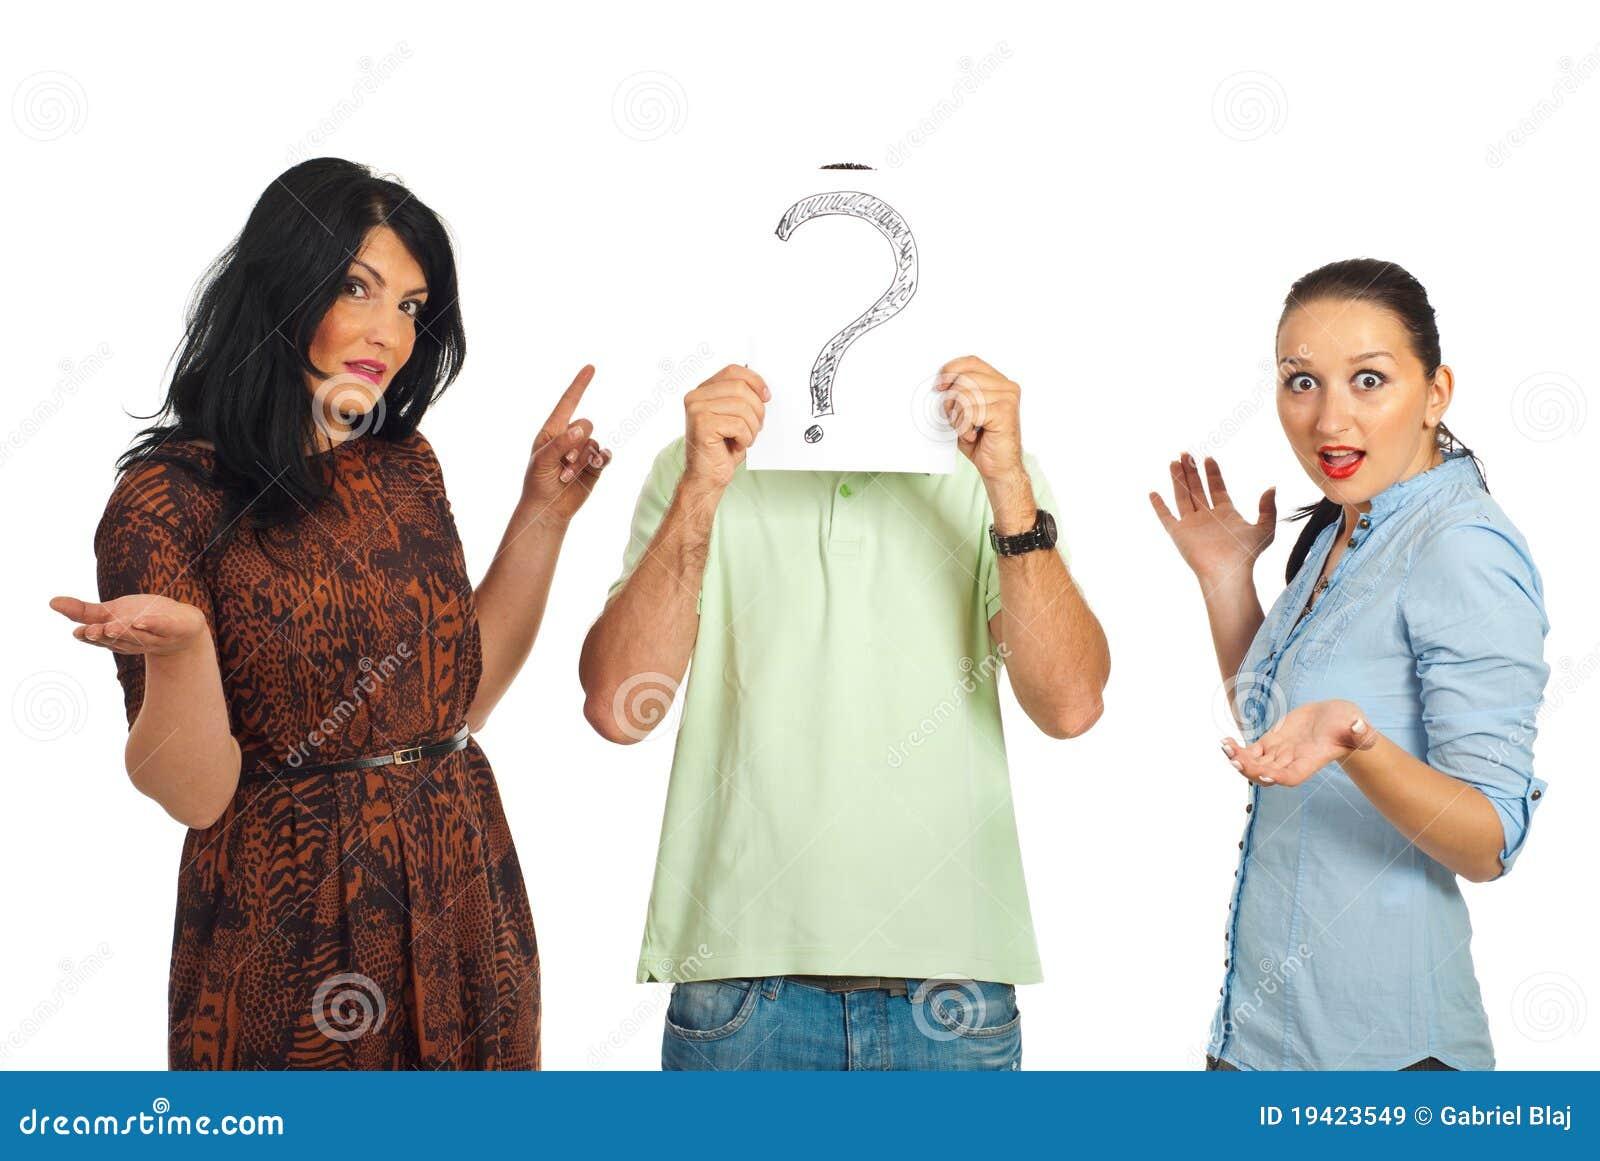 Guy surprised unknown women